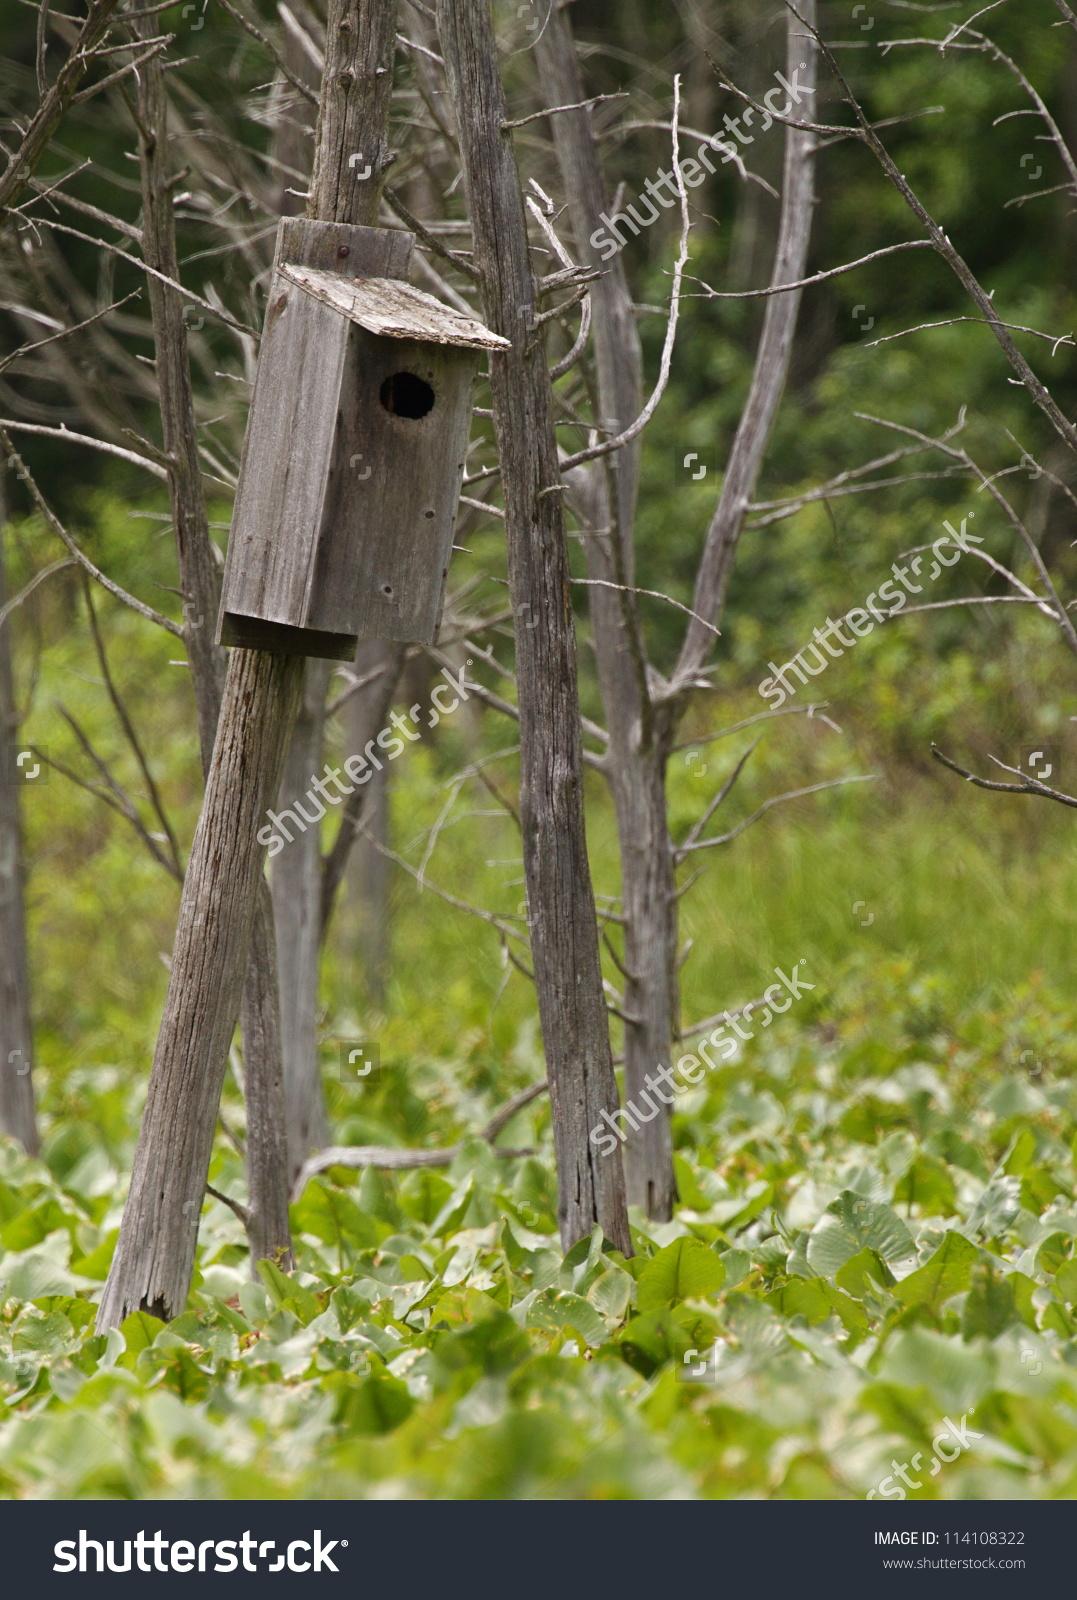 Wood Duck Nest Box Bird House Stock Photo 114108322.